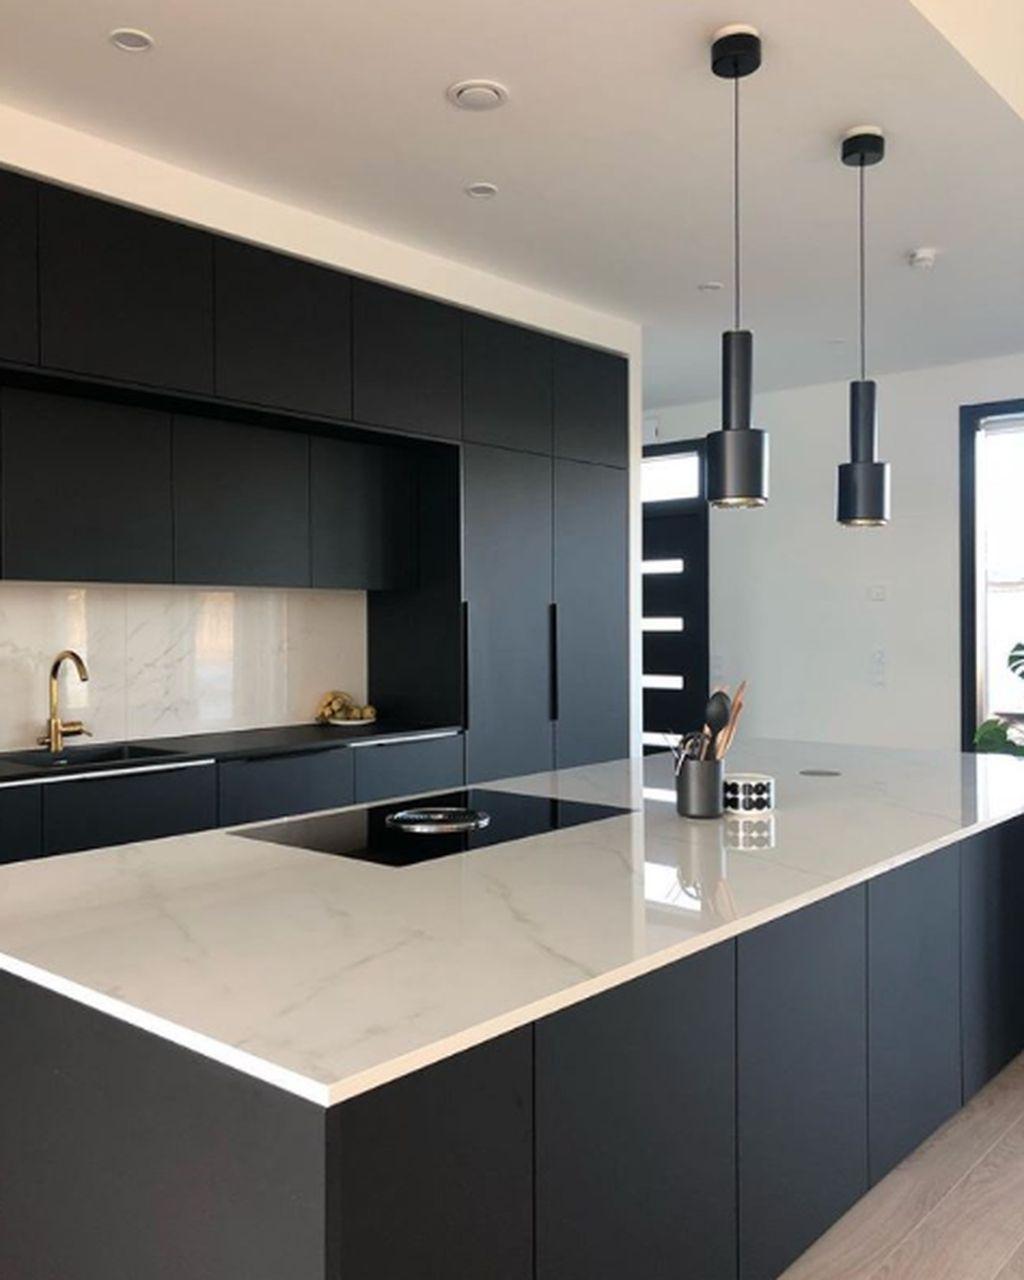 50 Black Kitchen Design Ideas With White Color Accent Sweetyhomee Modern Kitchen Design Kitchen Cabinet Design Stylish Kitchen